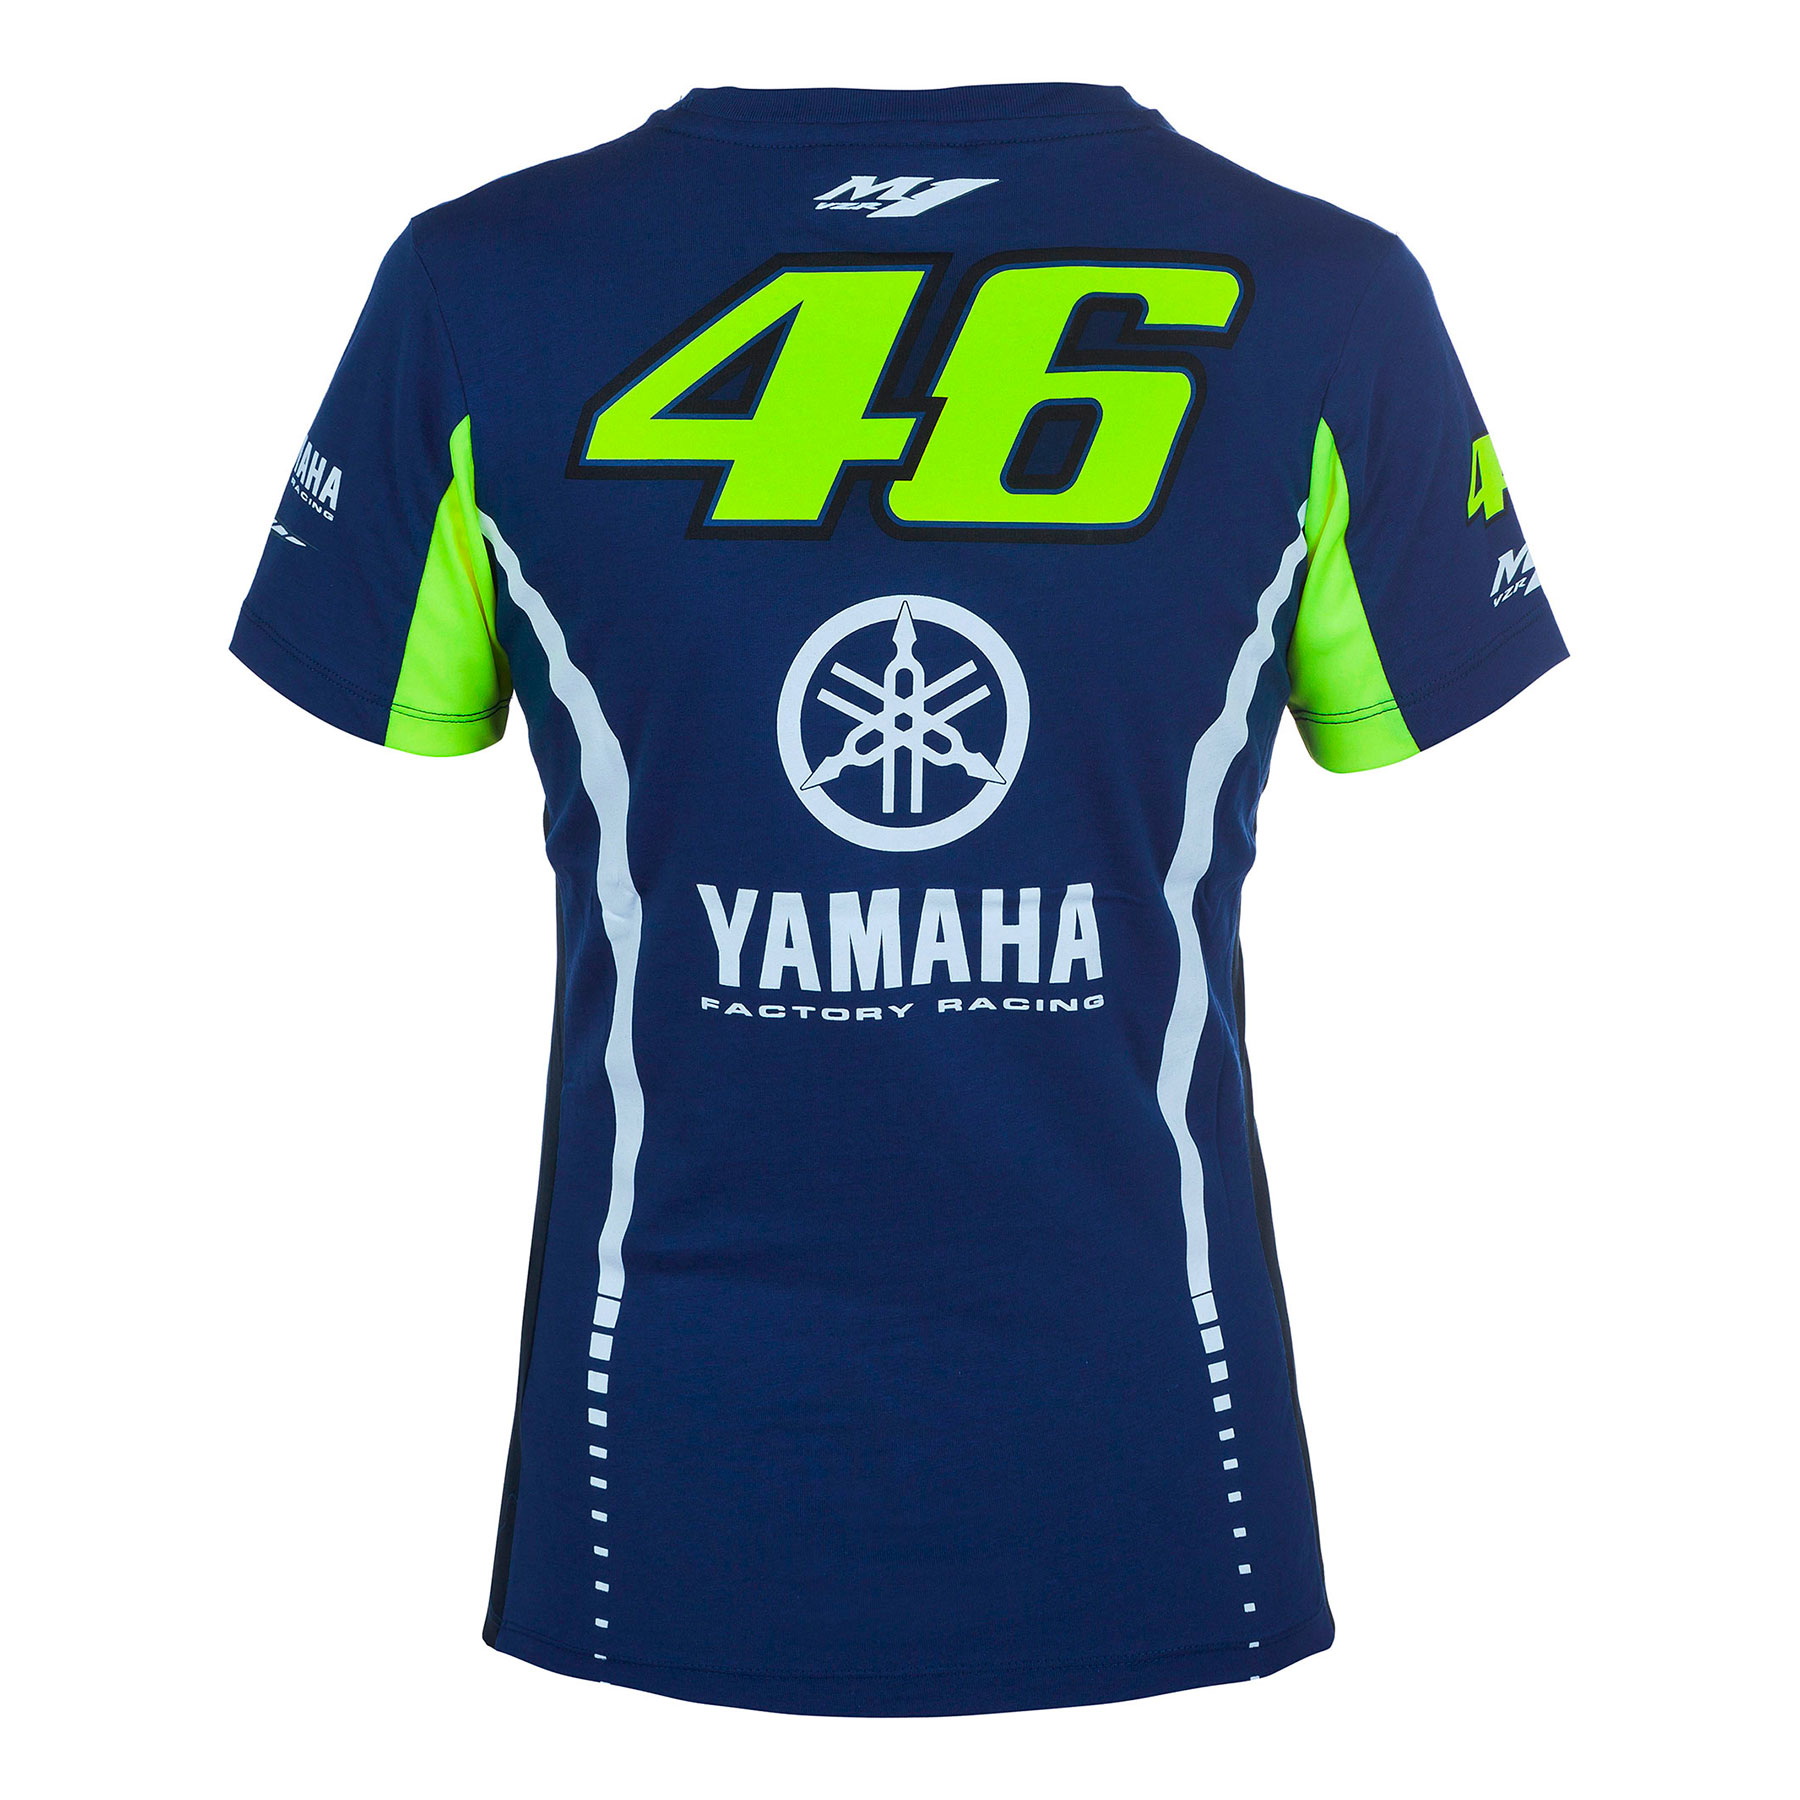 Camiseta Oficial Valentino Vr46 Mujer Yamaha Rossi 2017 TXiOkZwPul